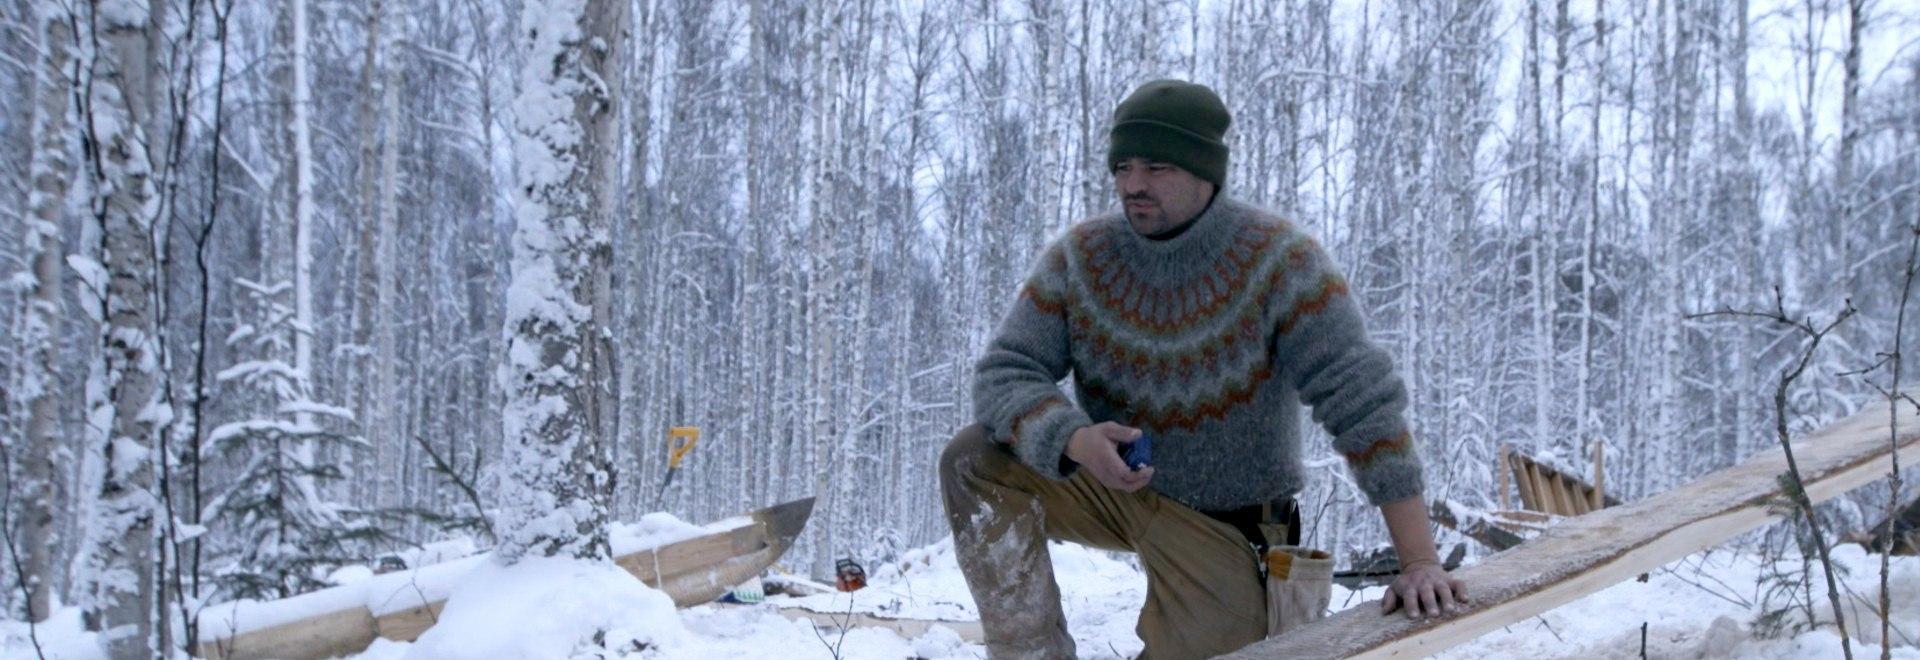 Alaska: i nuovi pionieri - Parte seconda